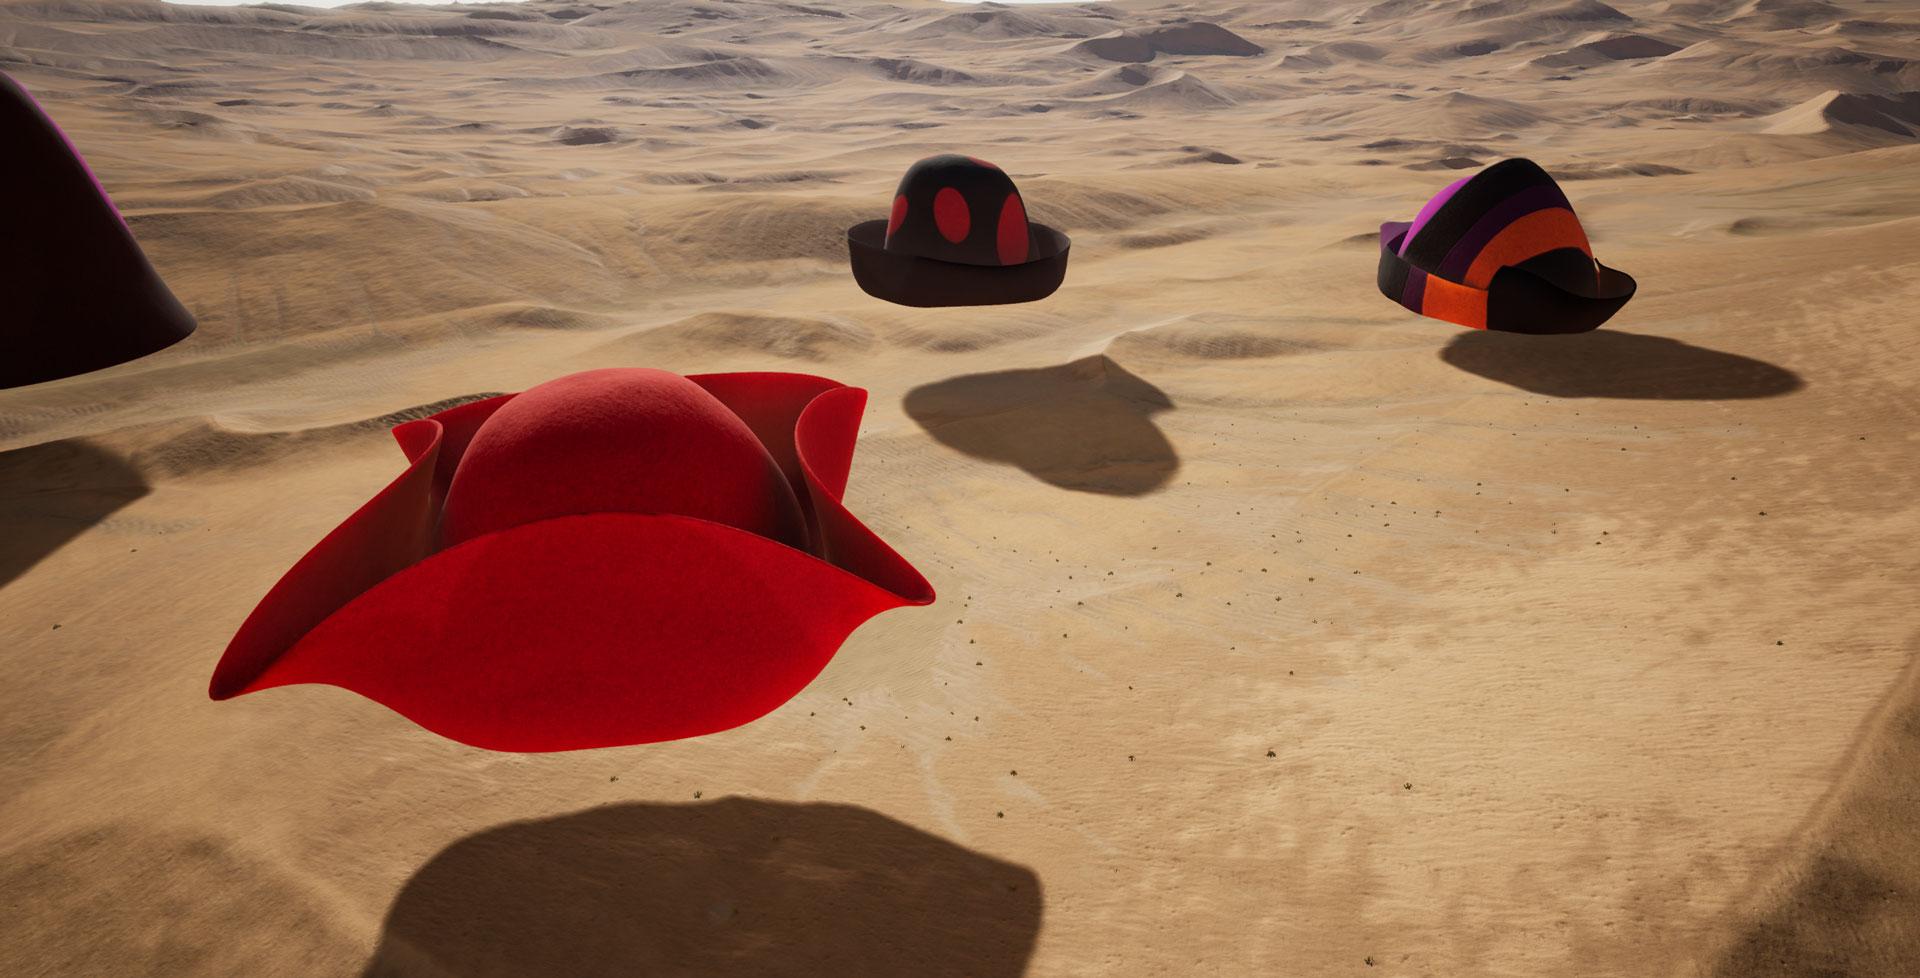 Textile-art-of-today-desert-02